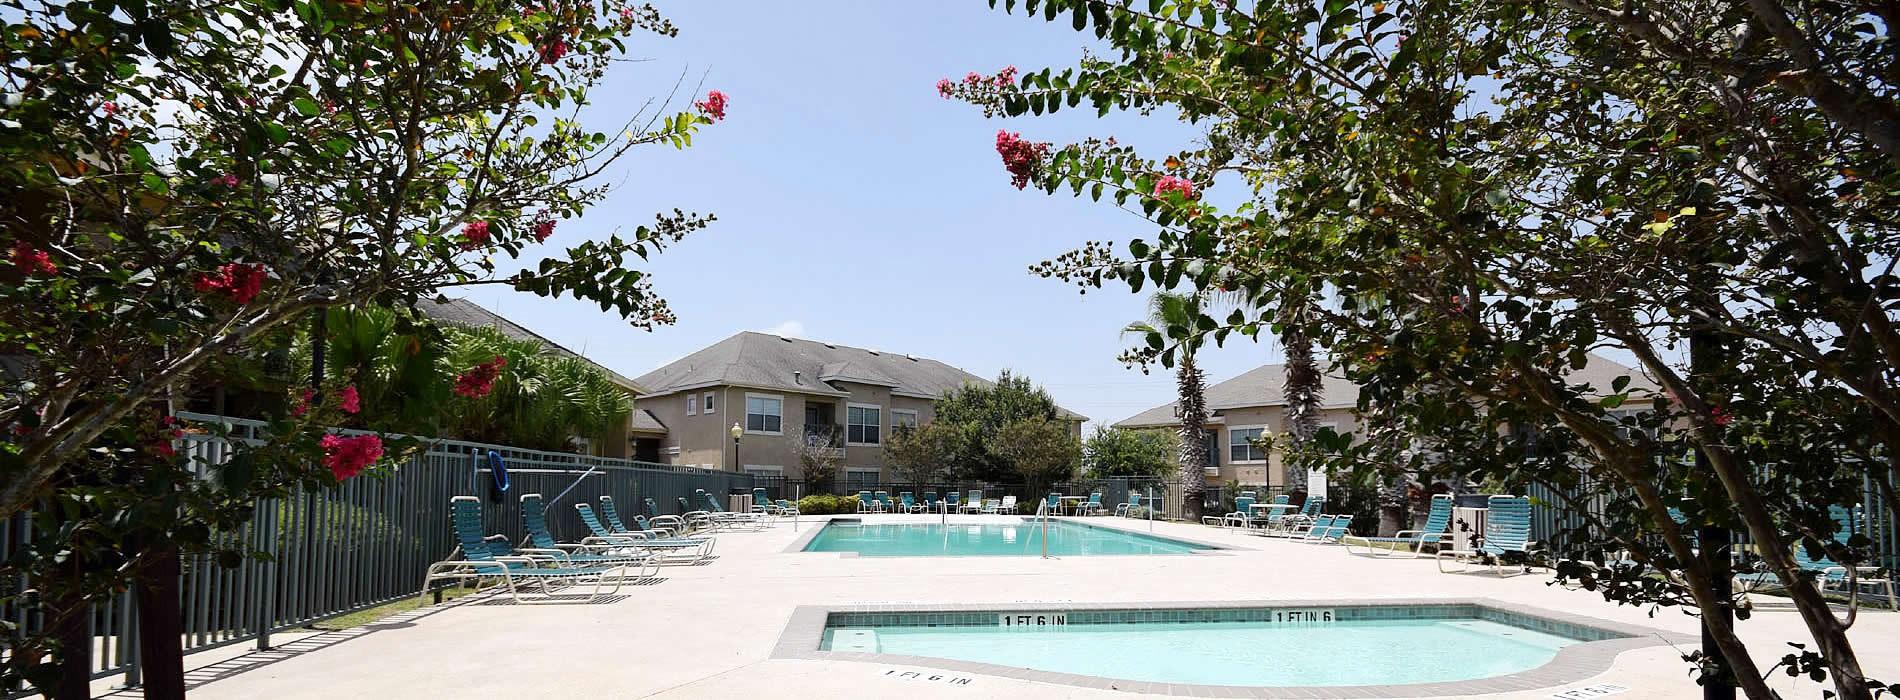 River Square Apartments | Corpus Christi, TX | (361) 241-8822